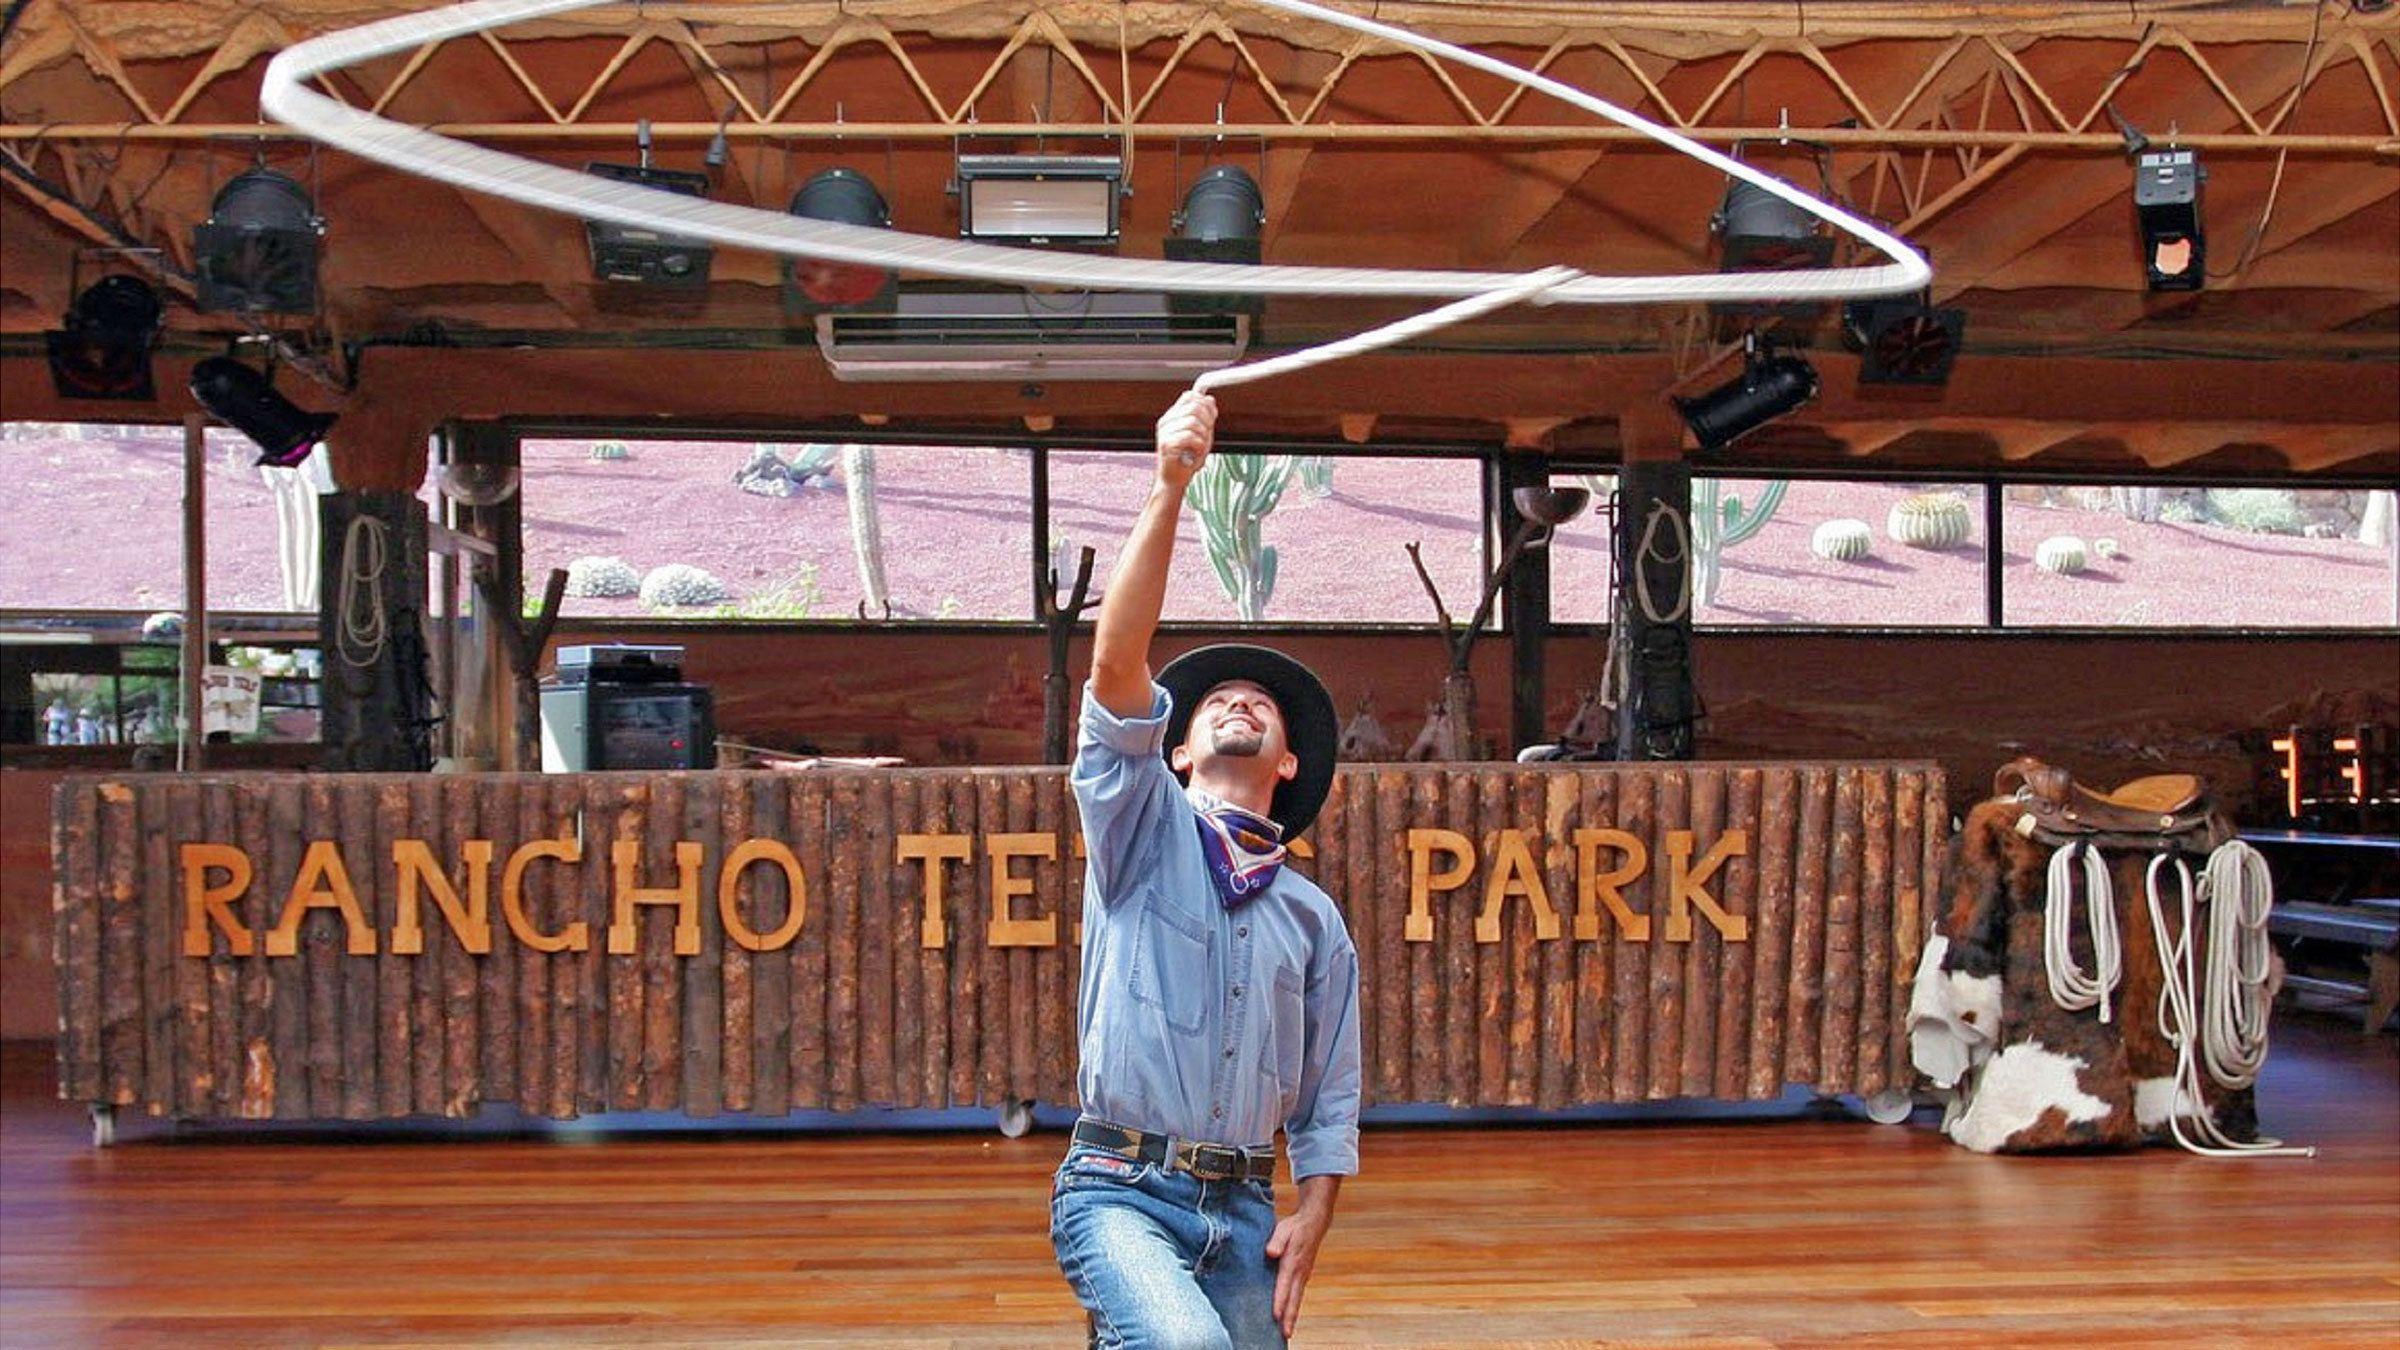 Toegang tot Rancho Texas Lanzarote Park